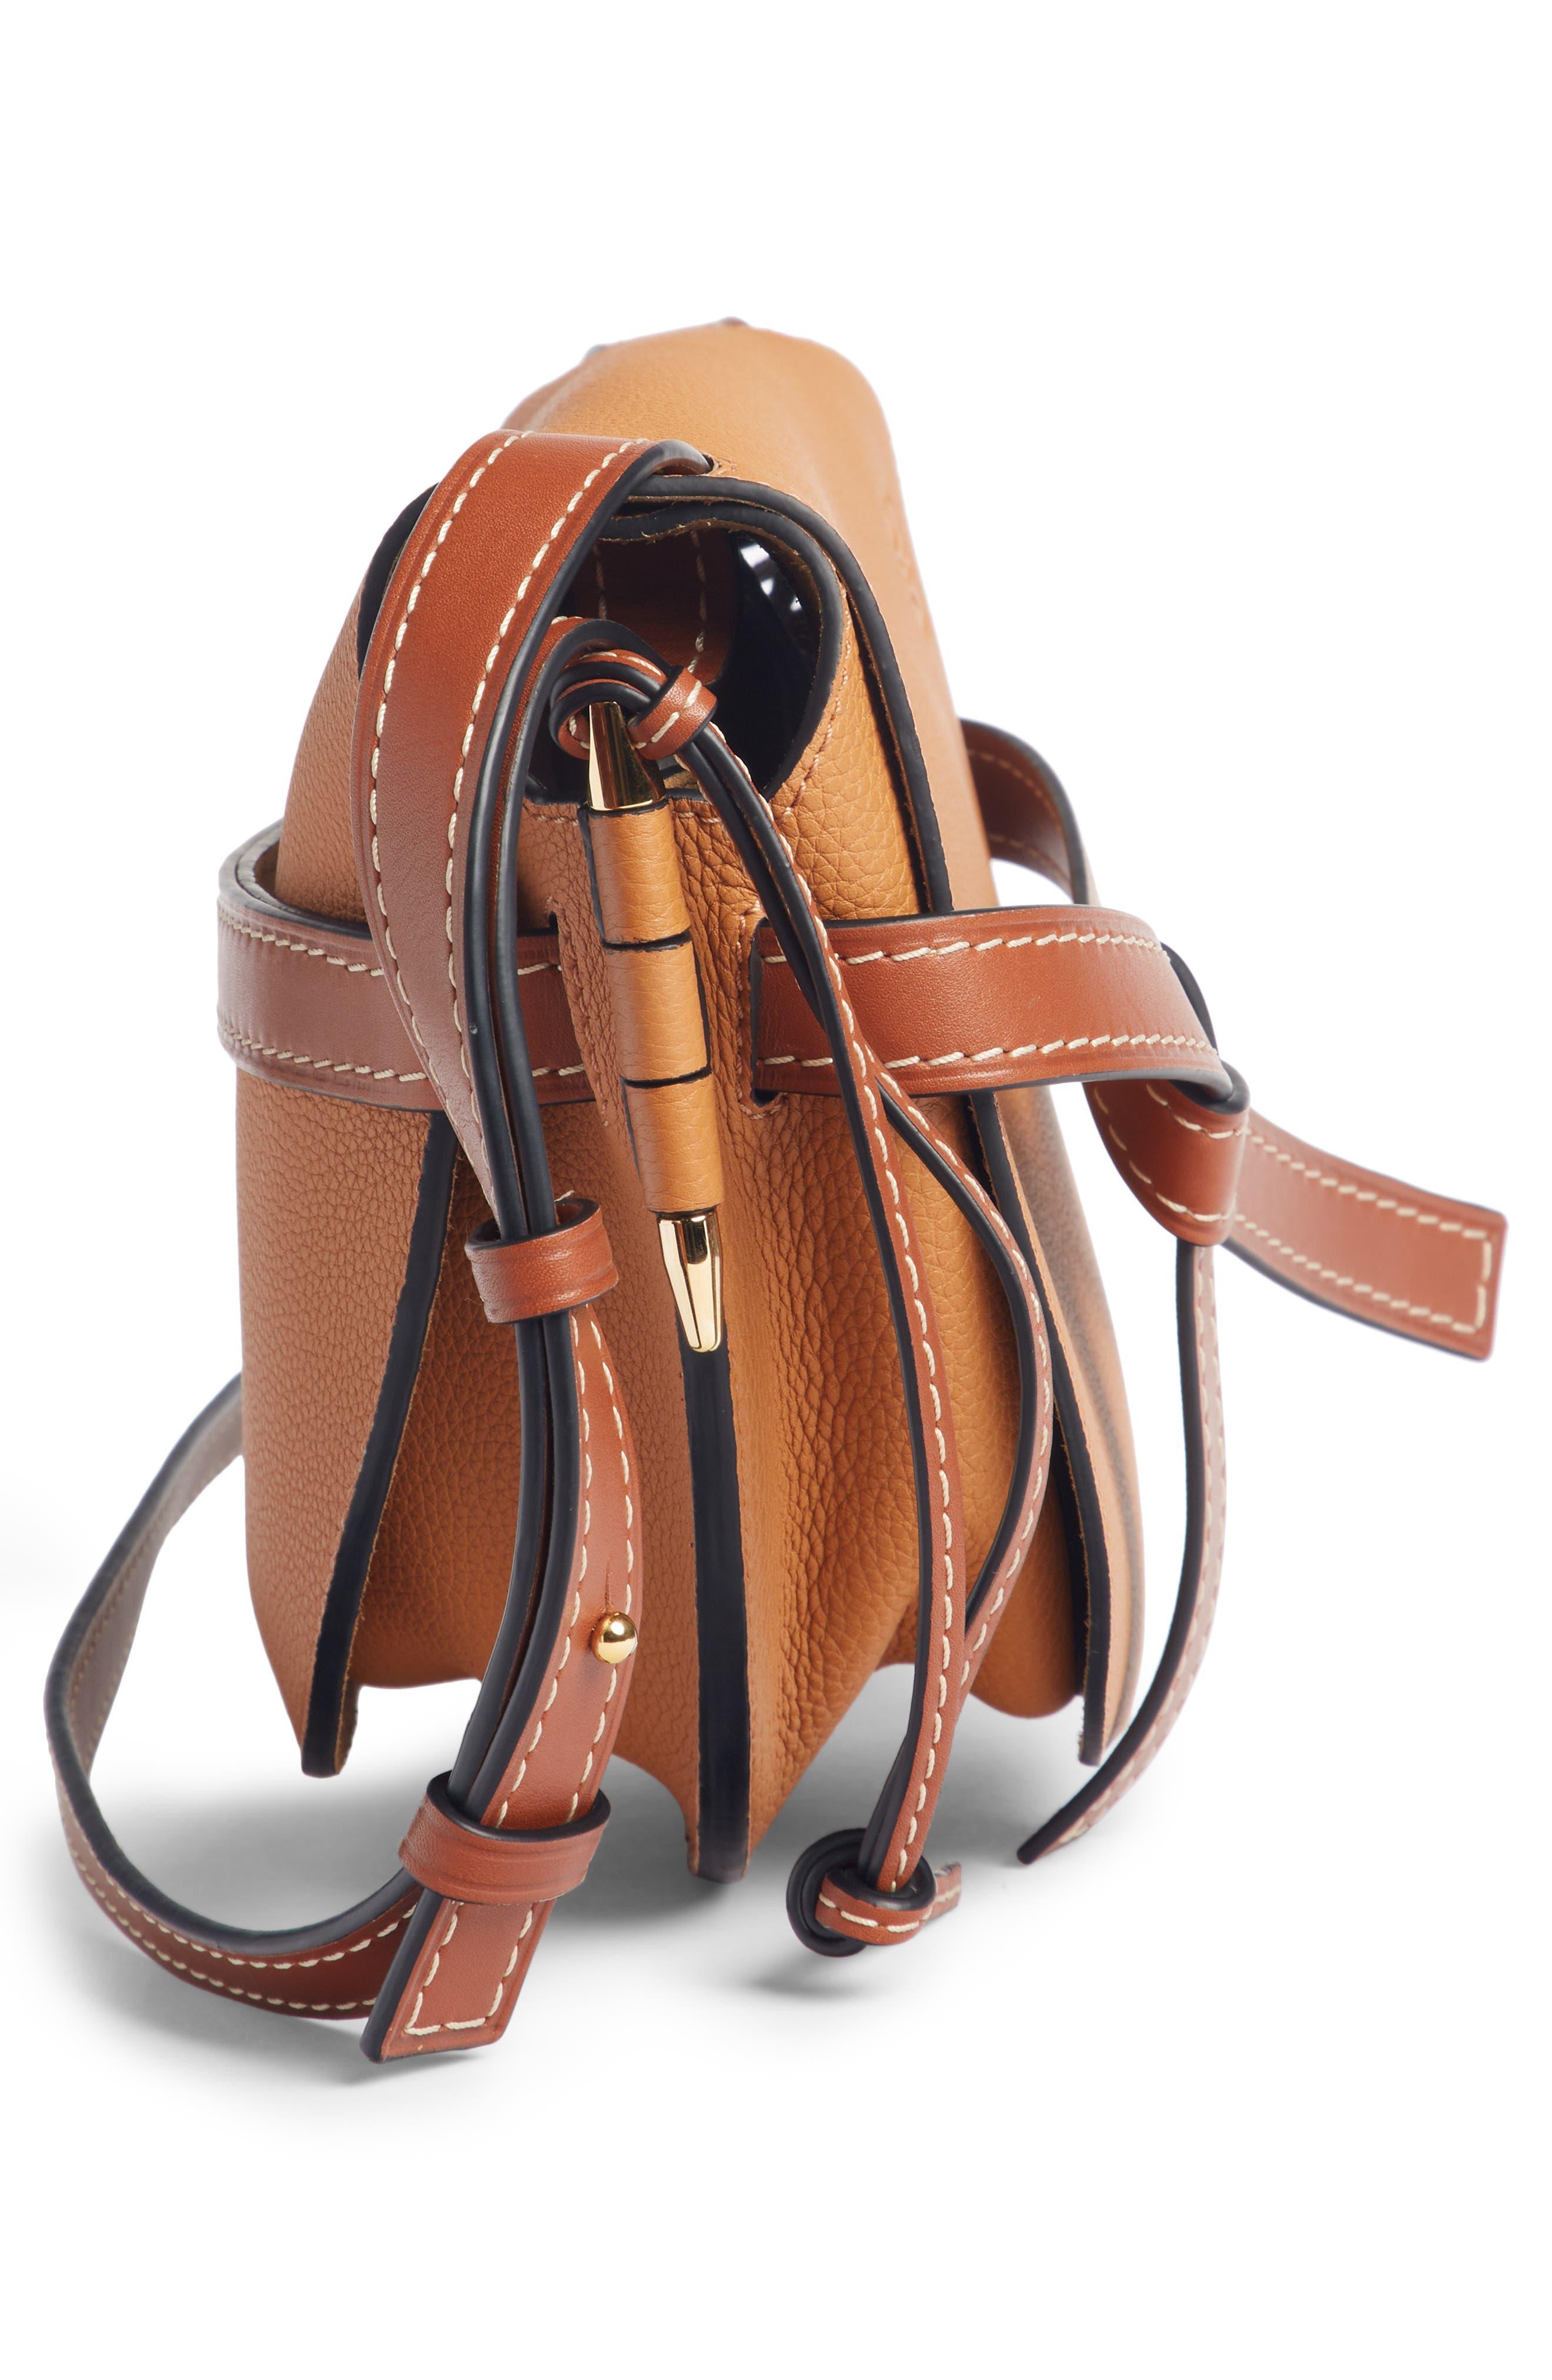 Small Gate Leather Crossbody Bag,                             Alternate thumbnail 4, color,                             LIGHT CARAMEL/ PECAN